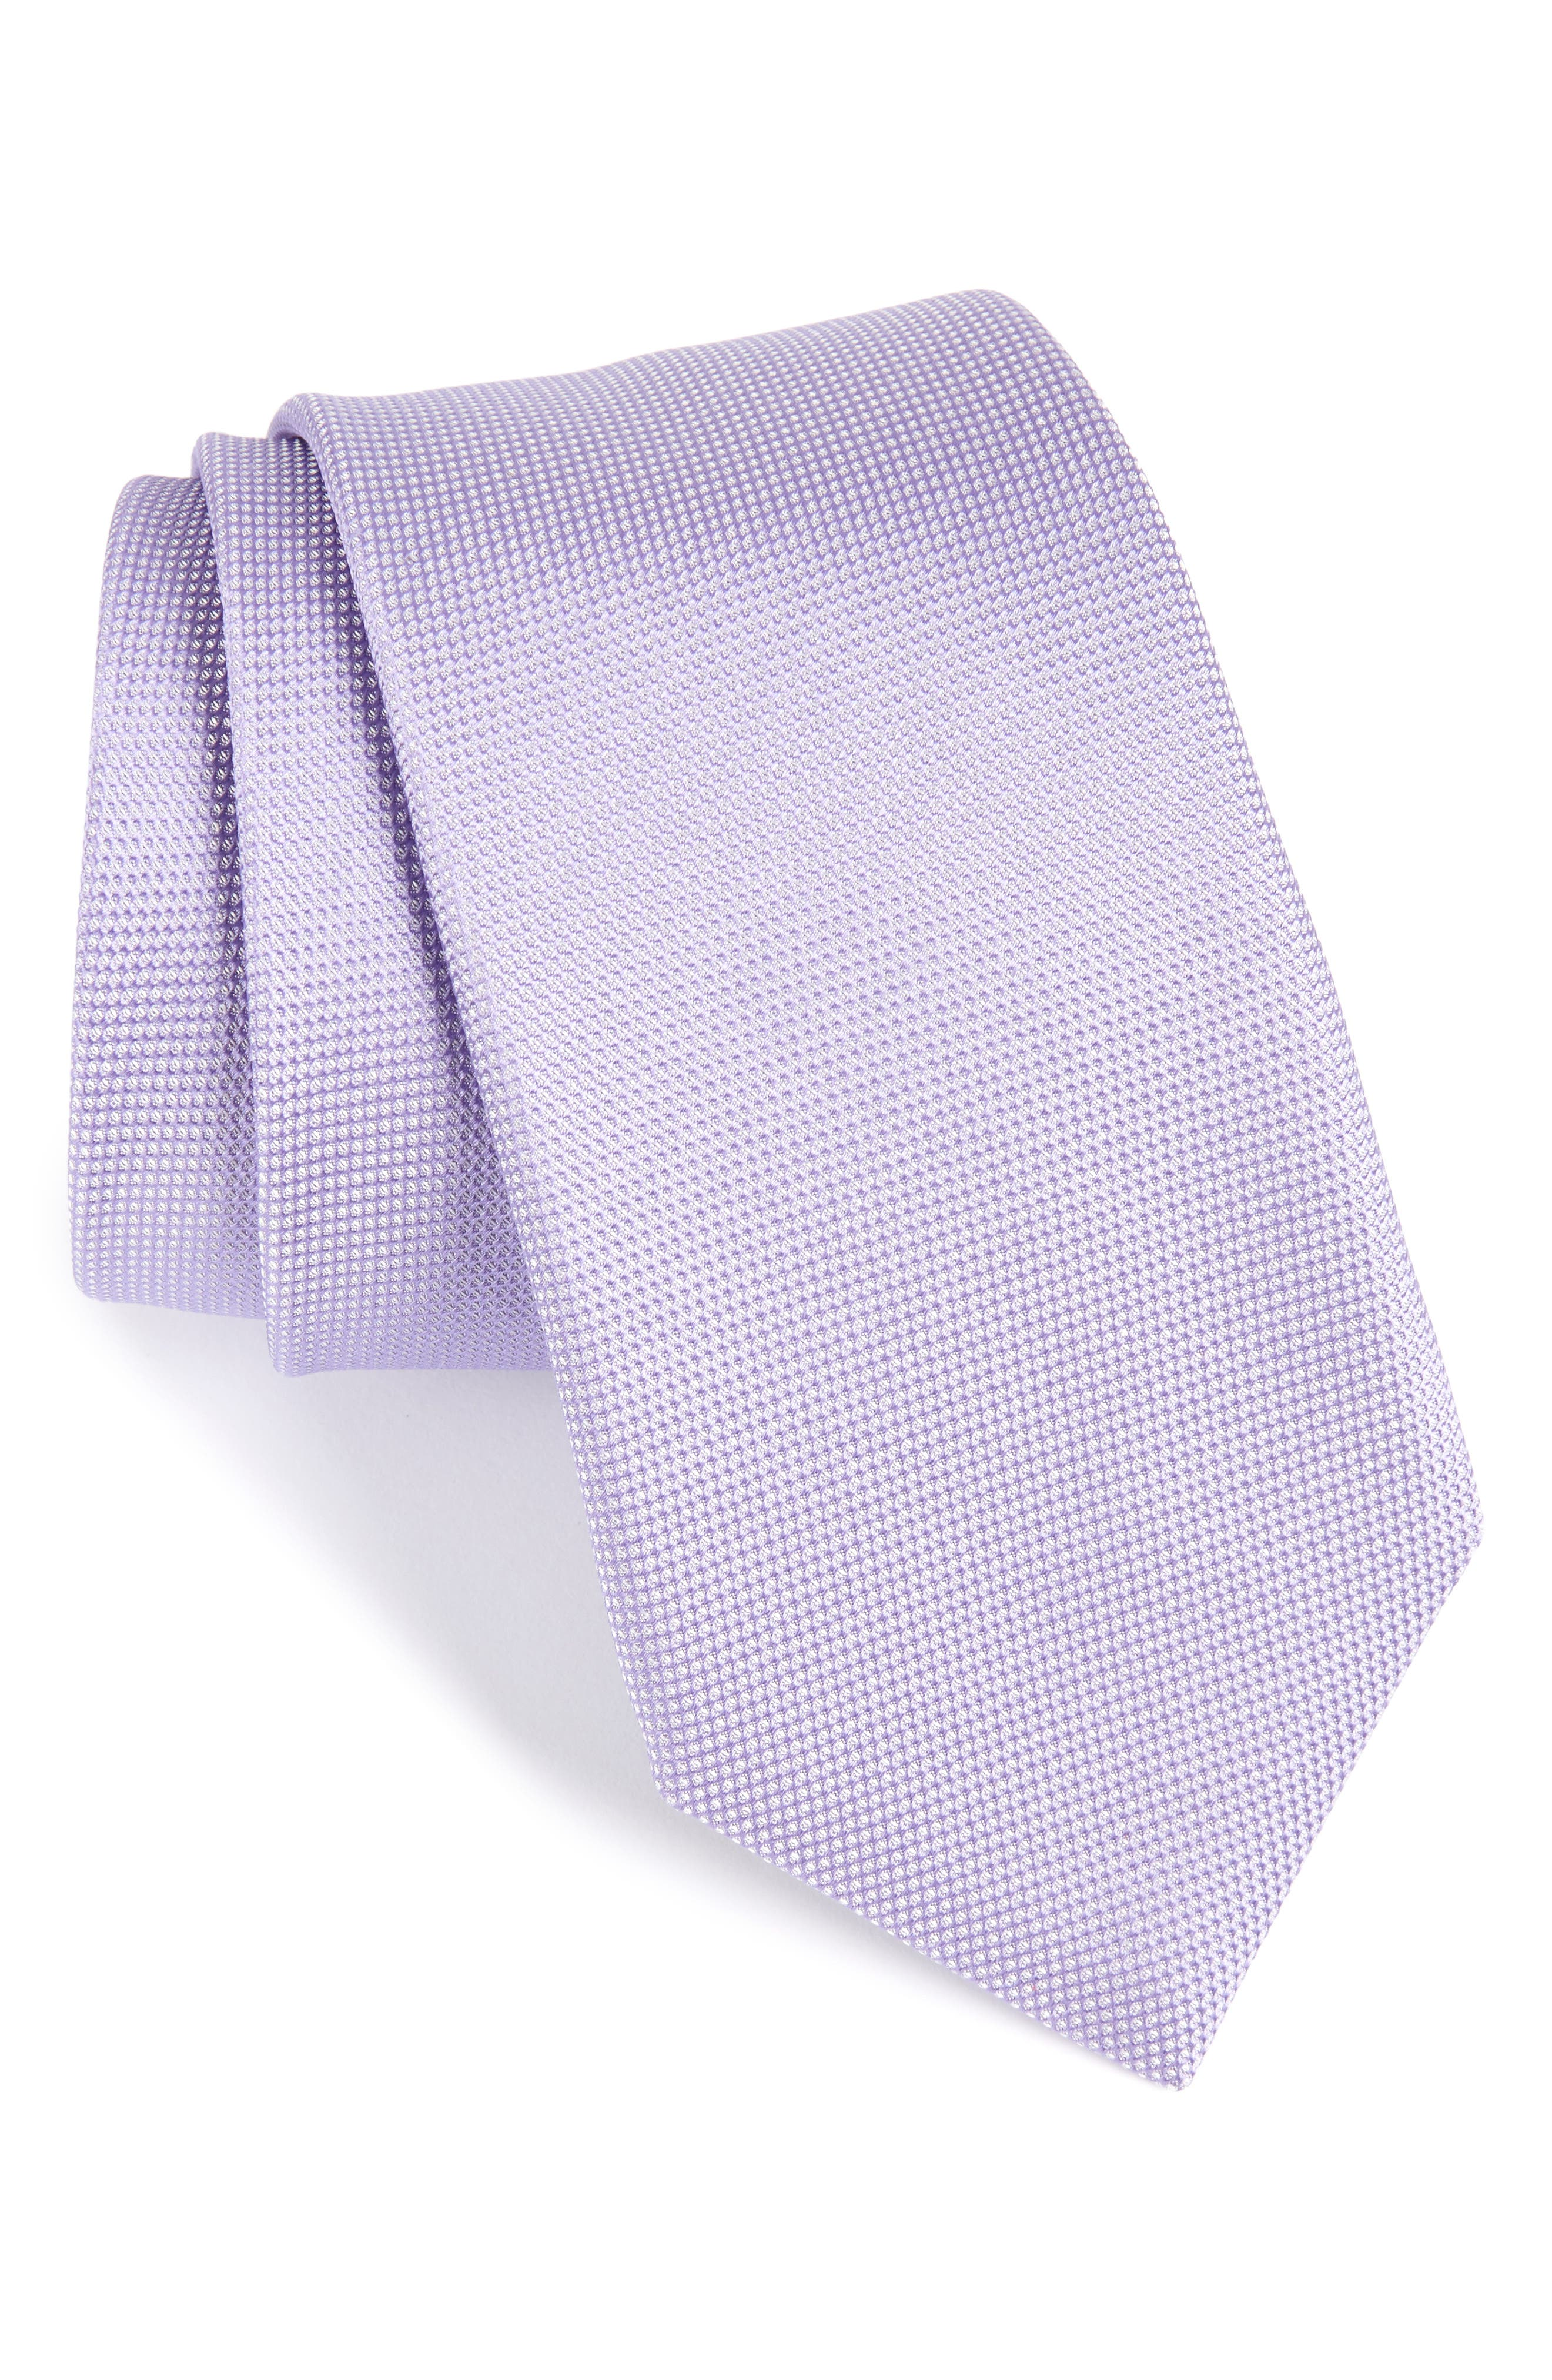 Alternate Image 1 Selected - BOSS Silk Tie